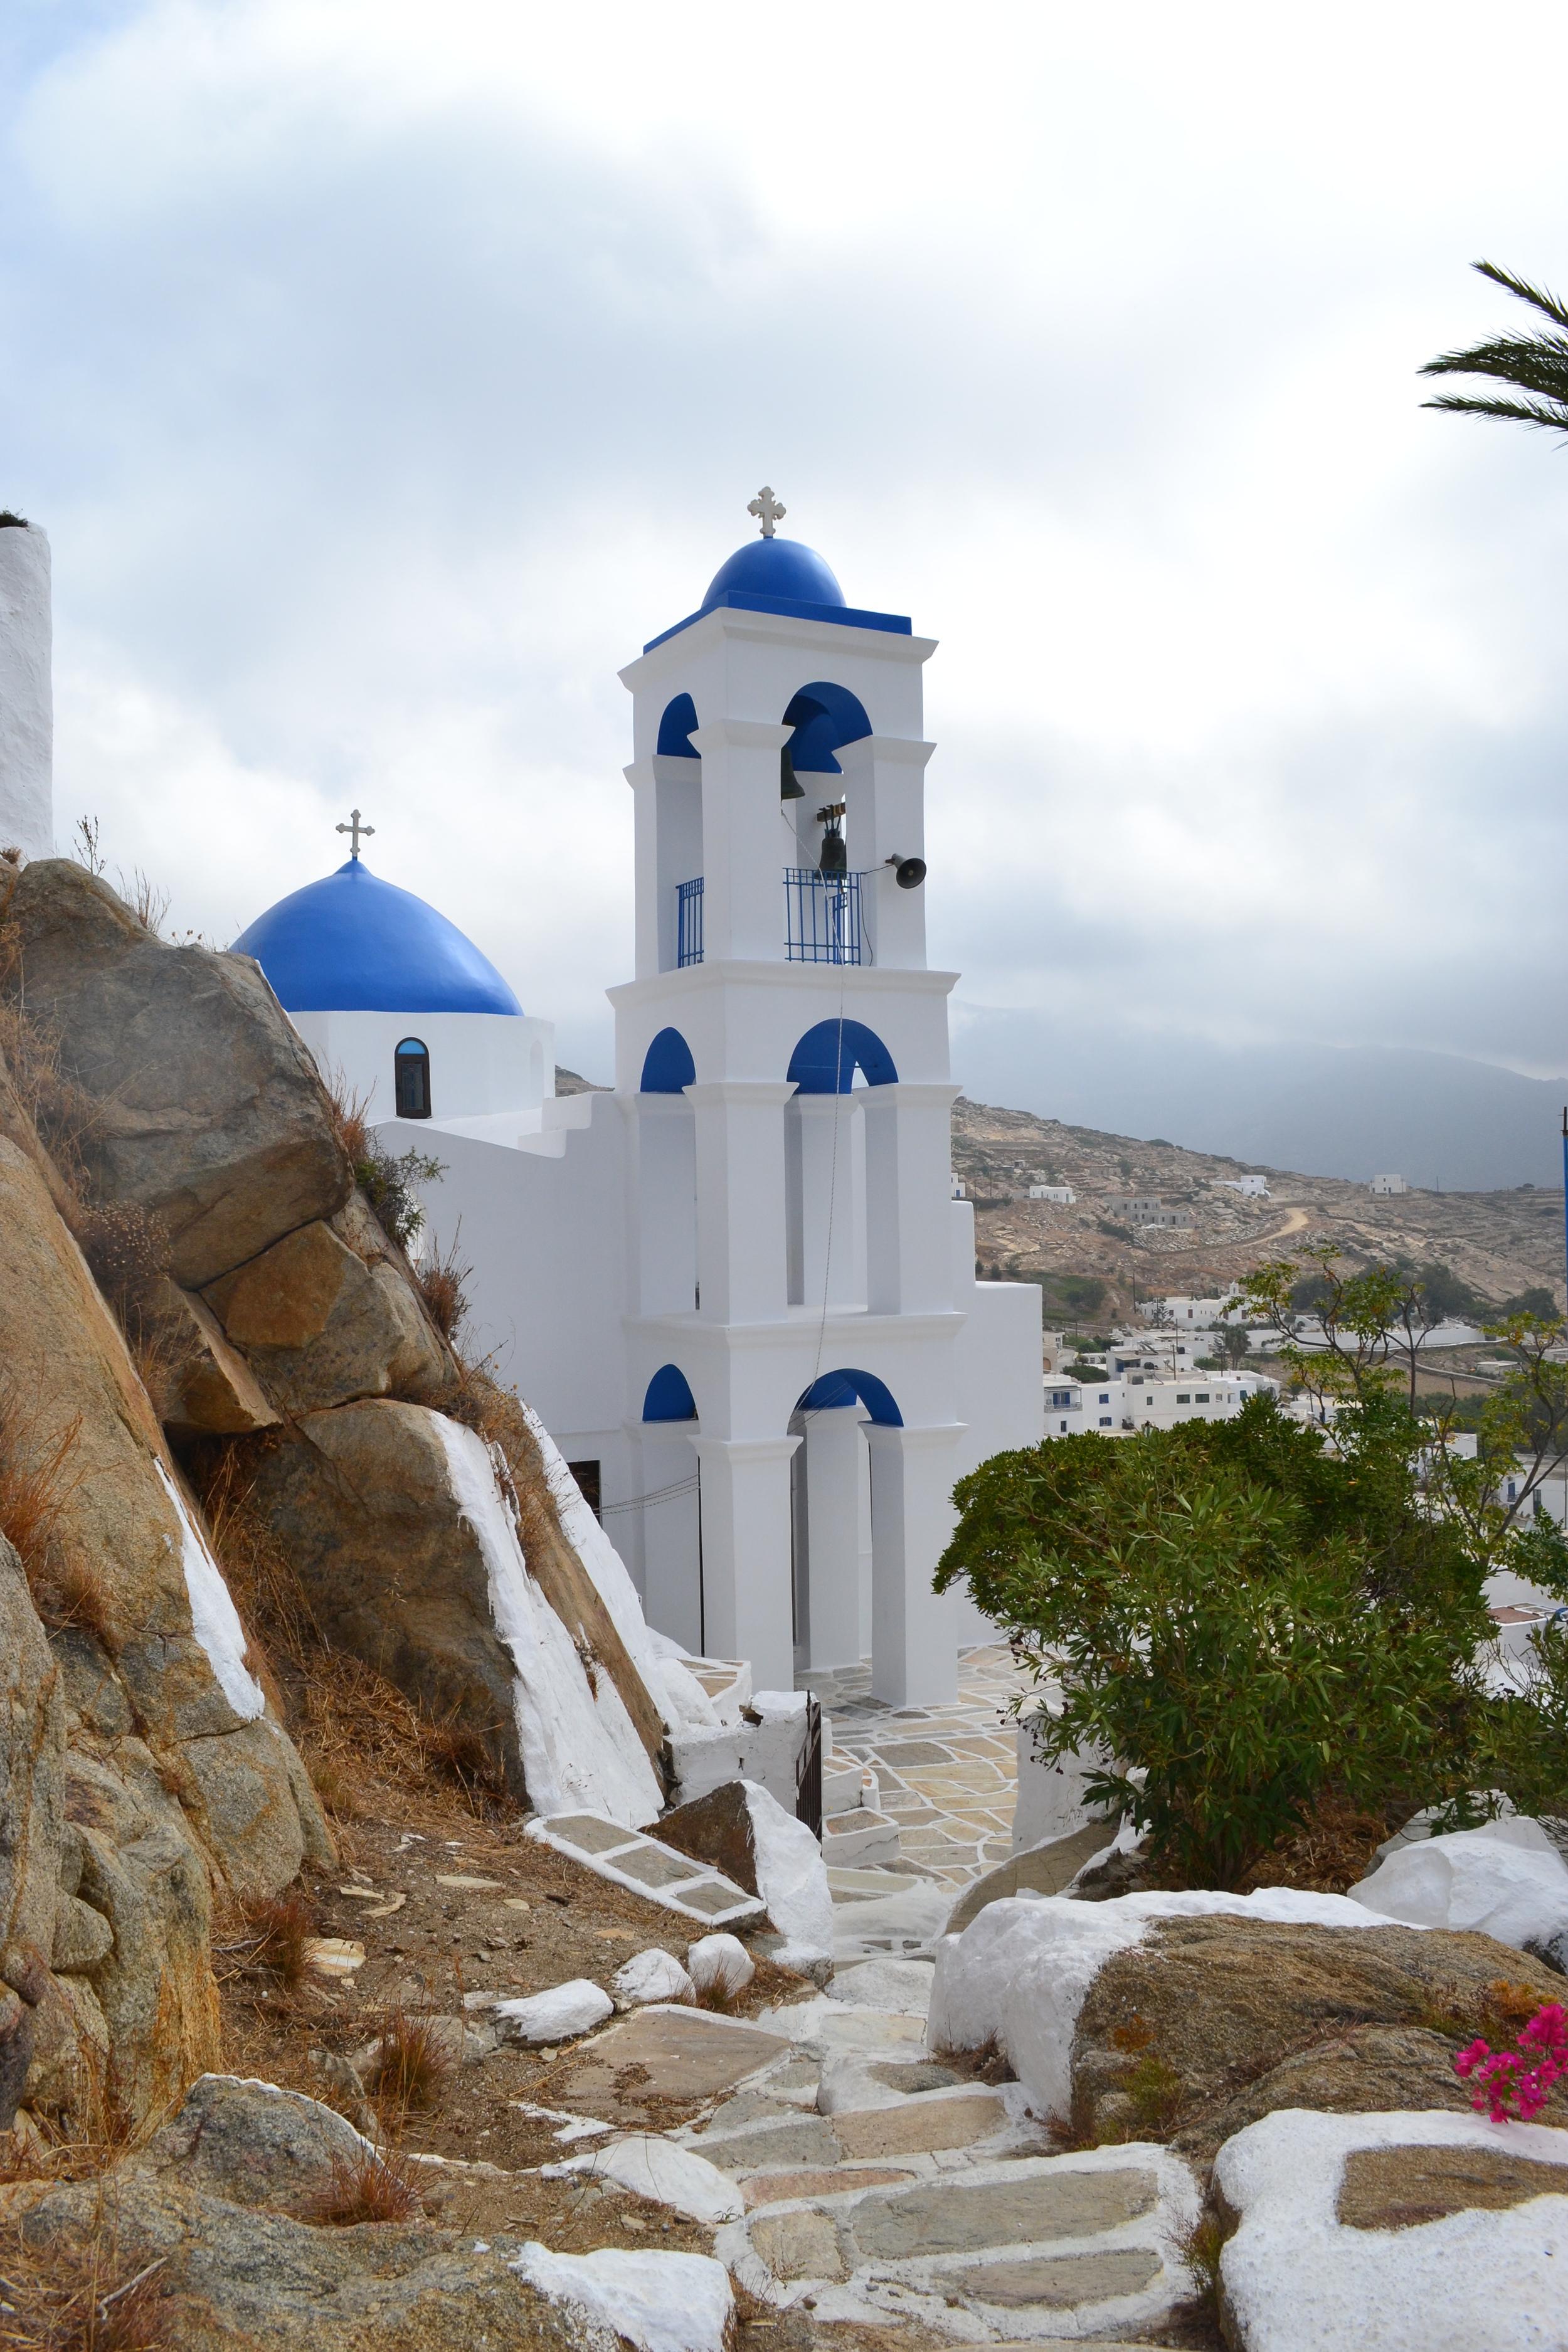 Panagia Gremiotissa -The church of Virgin Mary Gremiotissa is the trademark of the island.